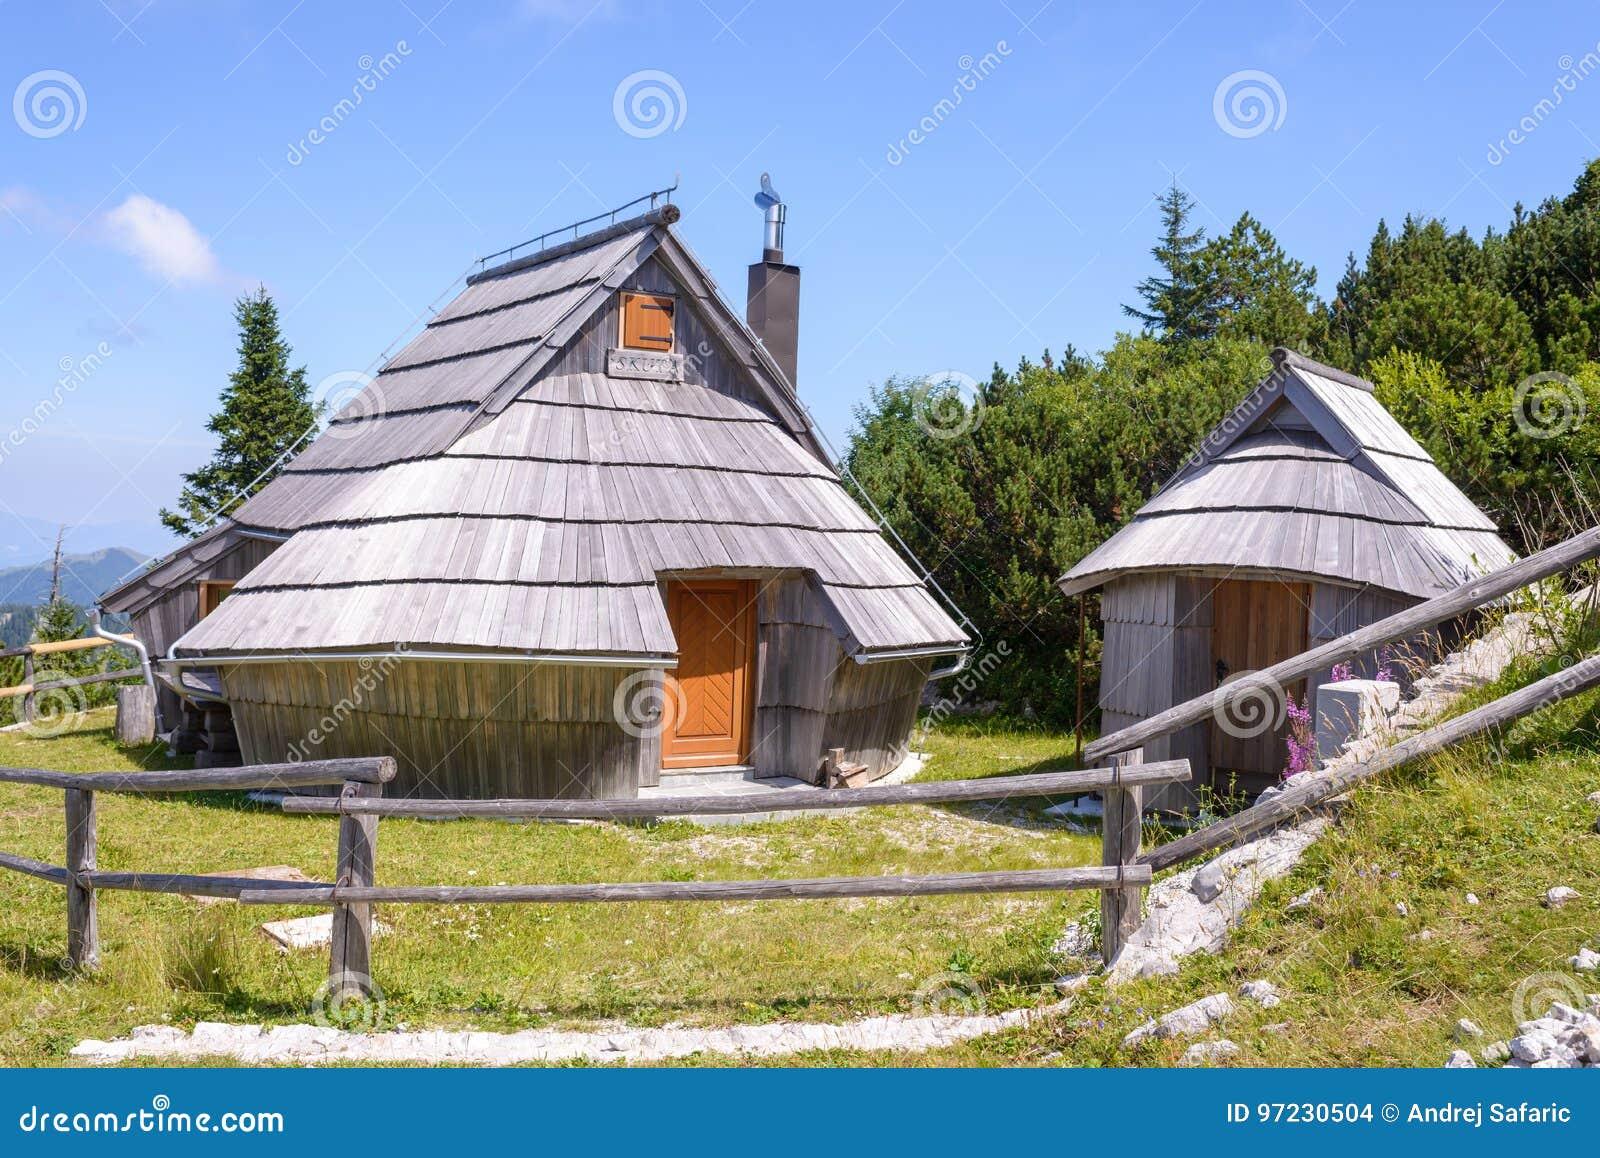 Meseta Del Planina De Velika Eslovenia Pueblo De Montana En Las